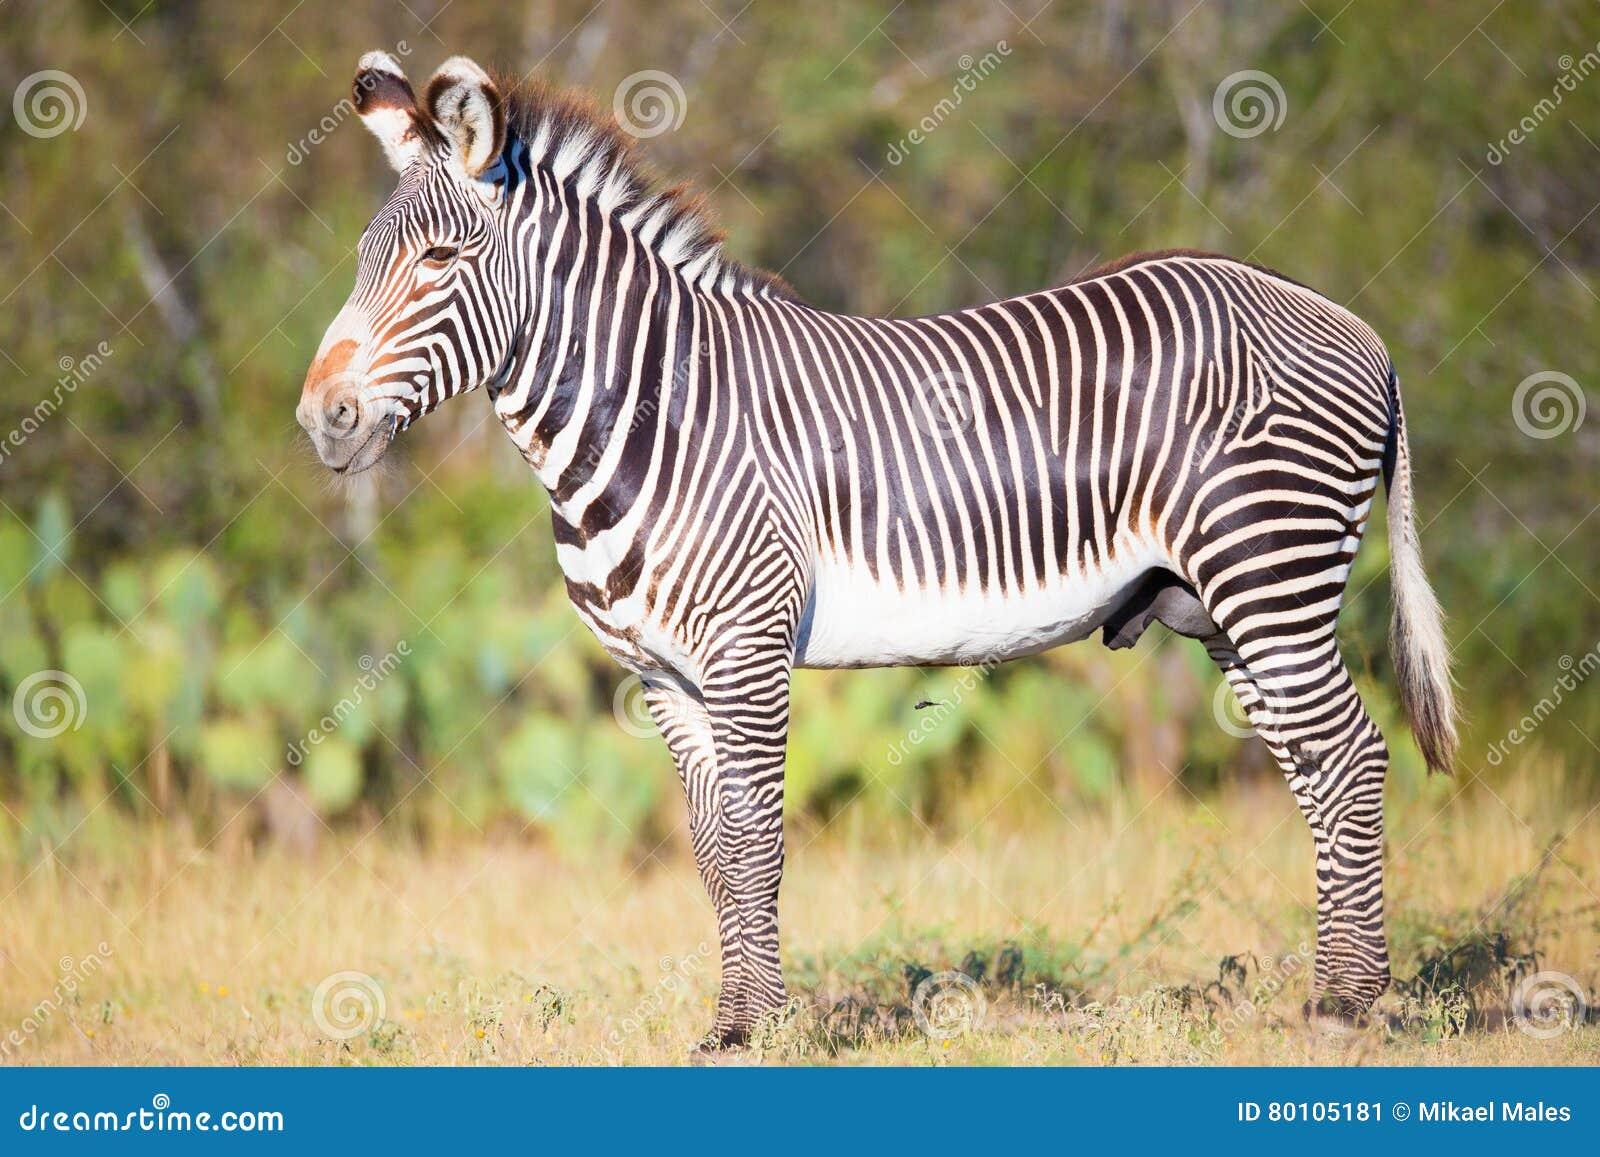 Young zebra standing